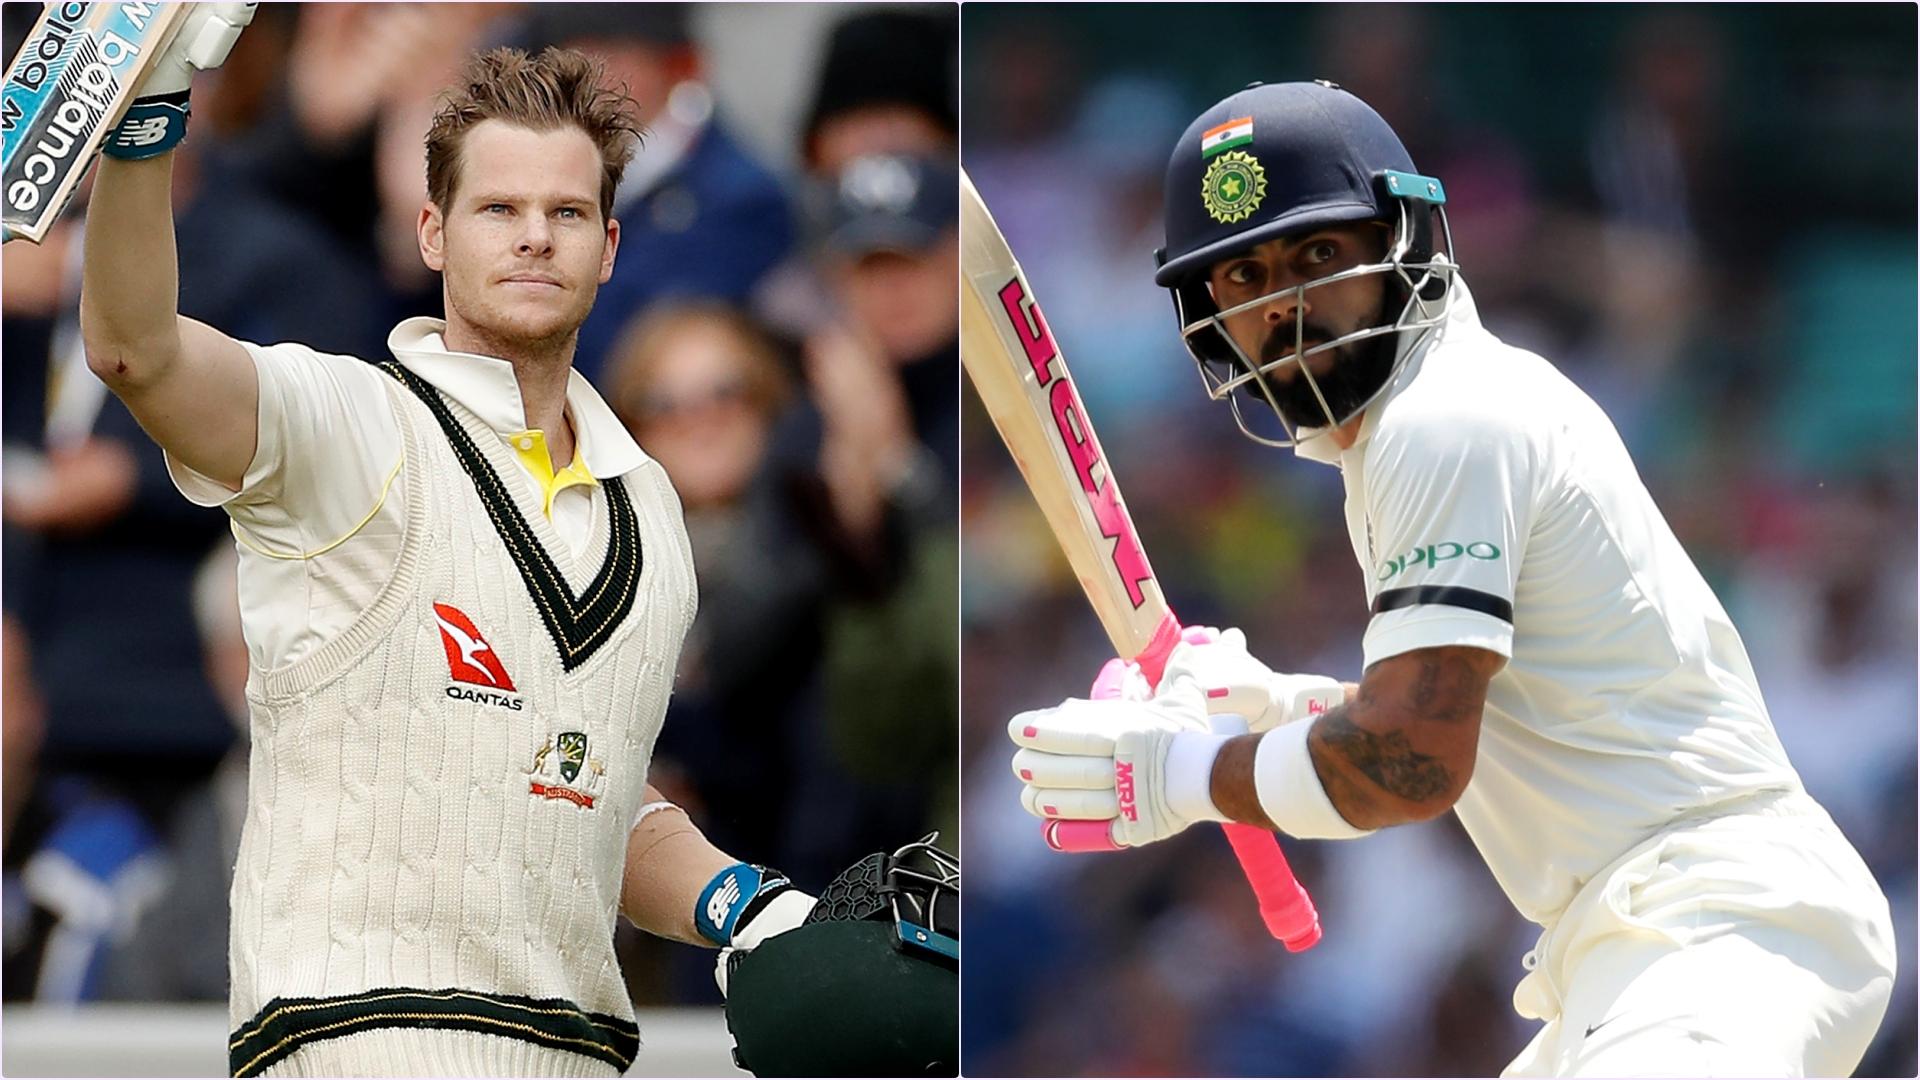 Latest ICC Test Player Rankings 2019: Virat Kohli Inches Closer to No.1 Batsman Steve Smith, Mayank Agarwal Enters Top 10 List